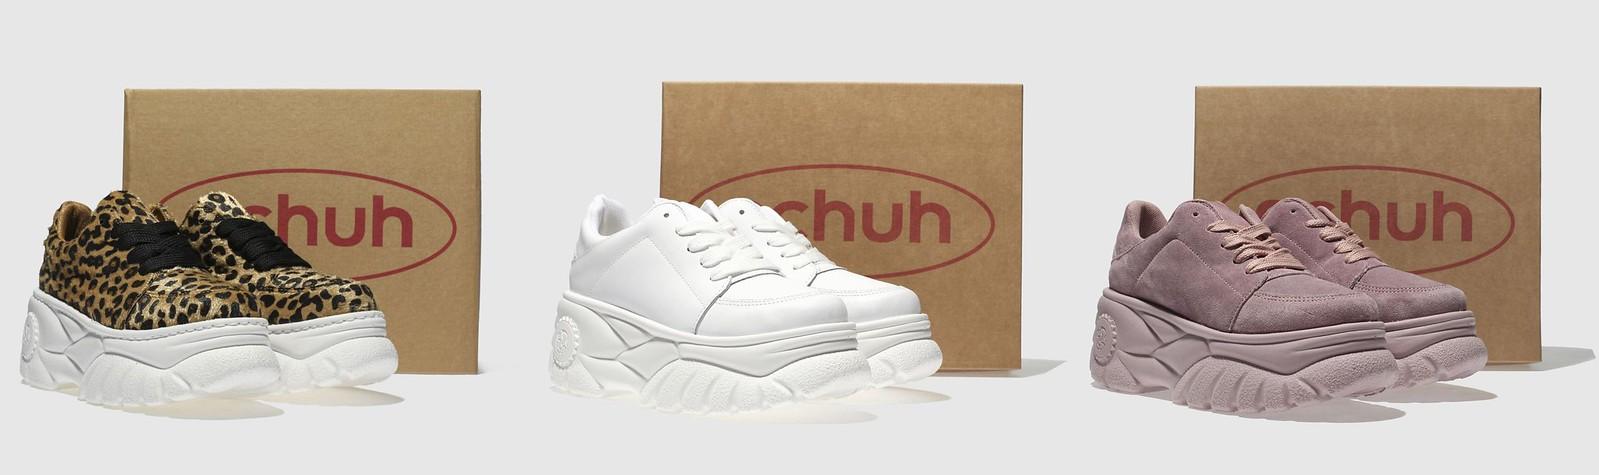 schuh platform trainers